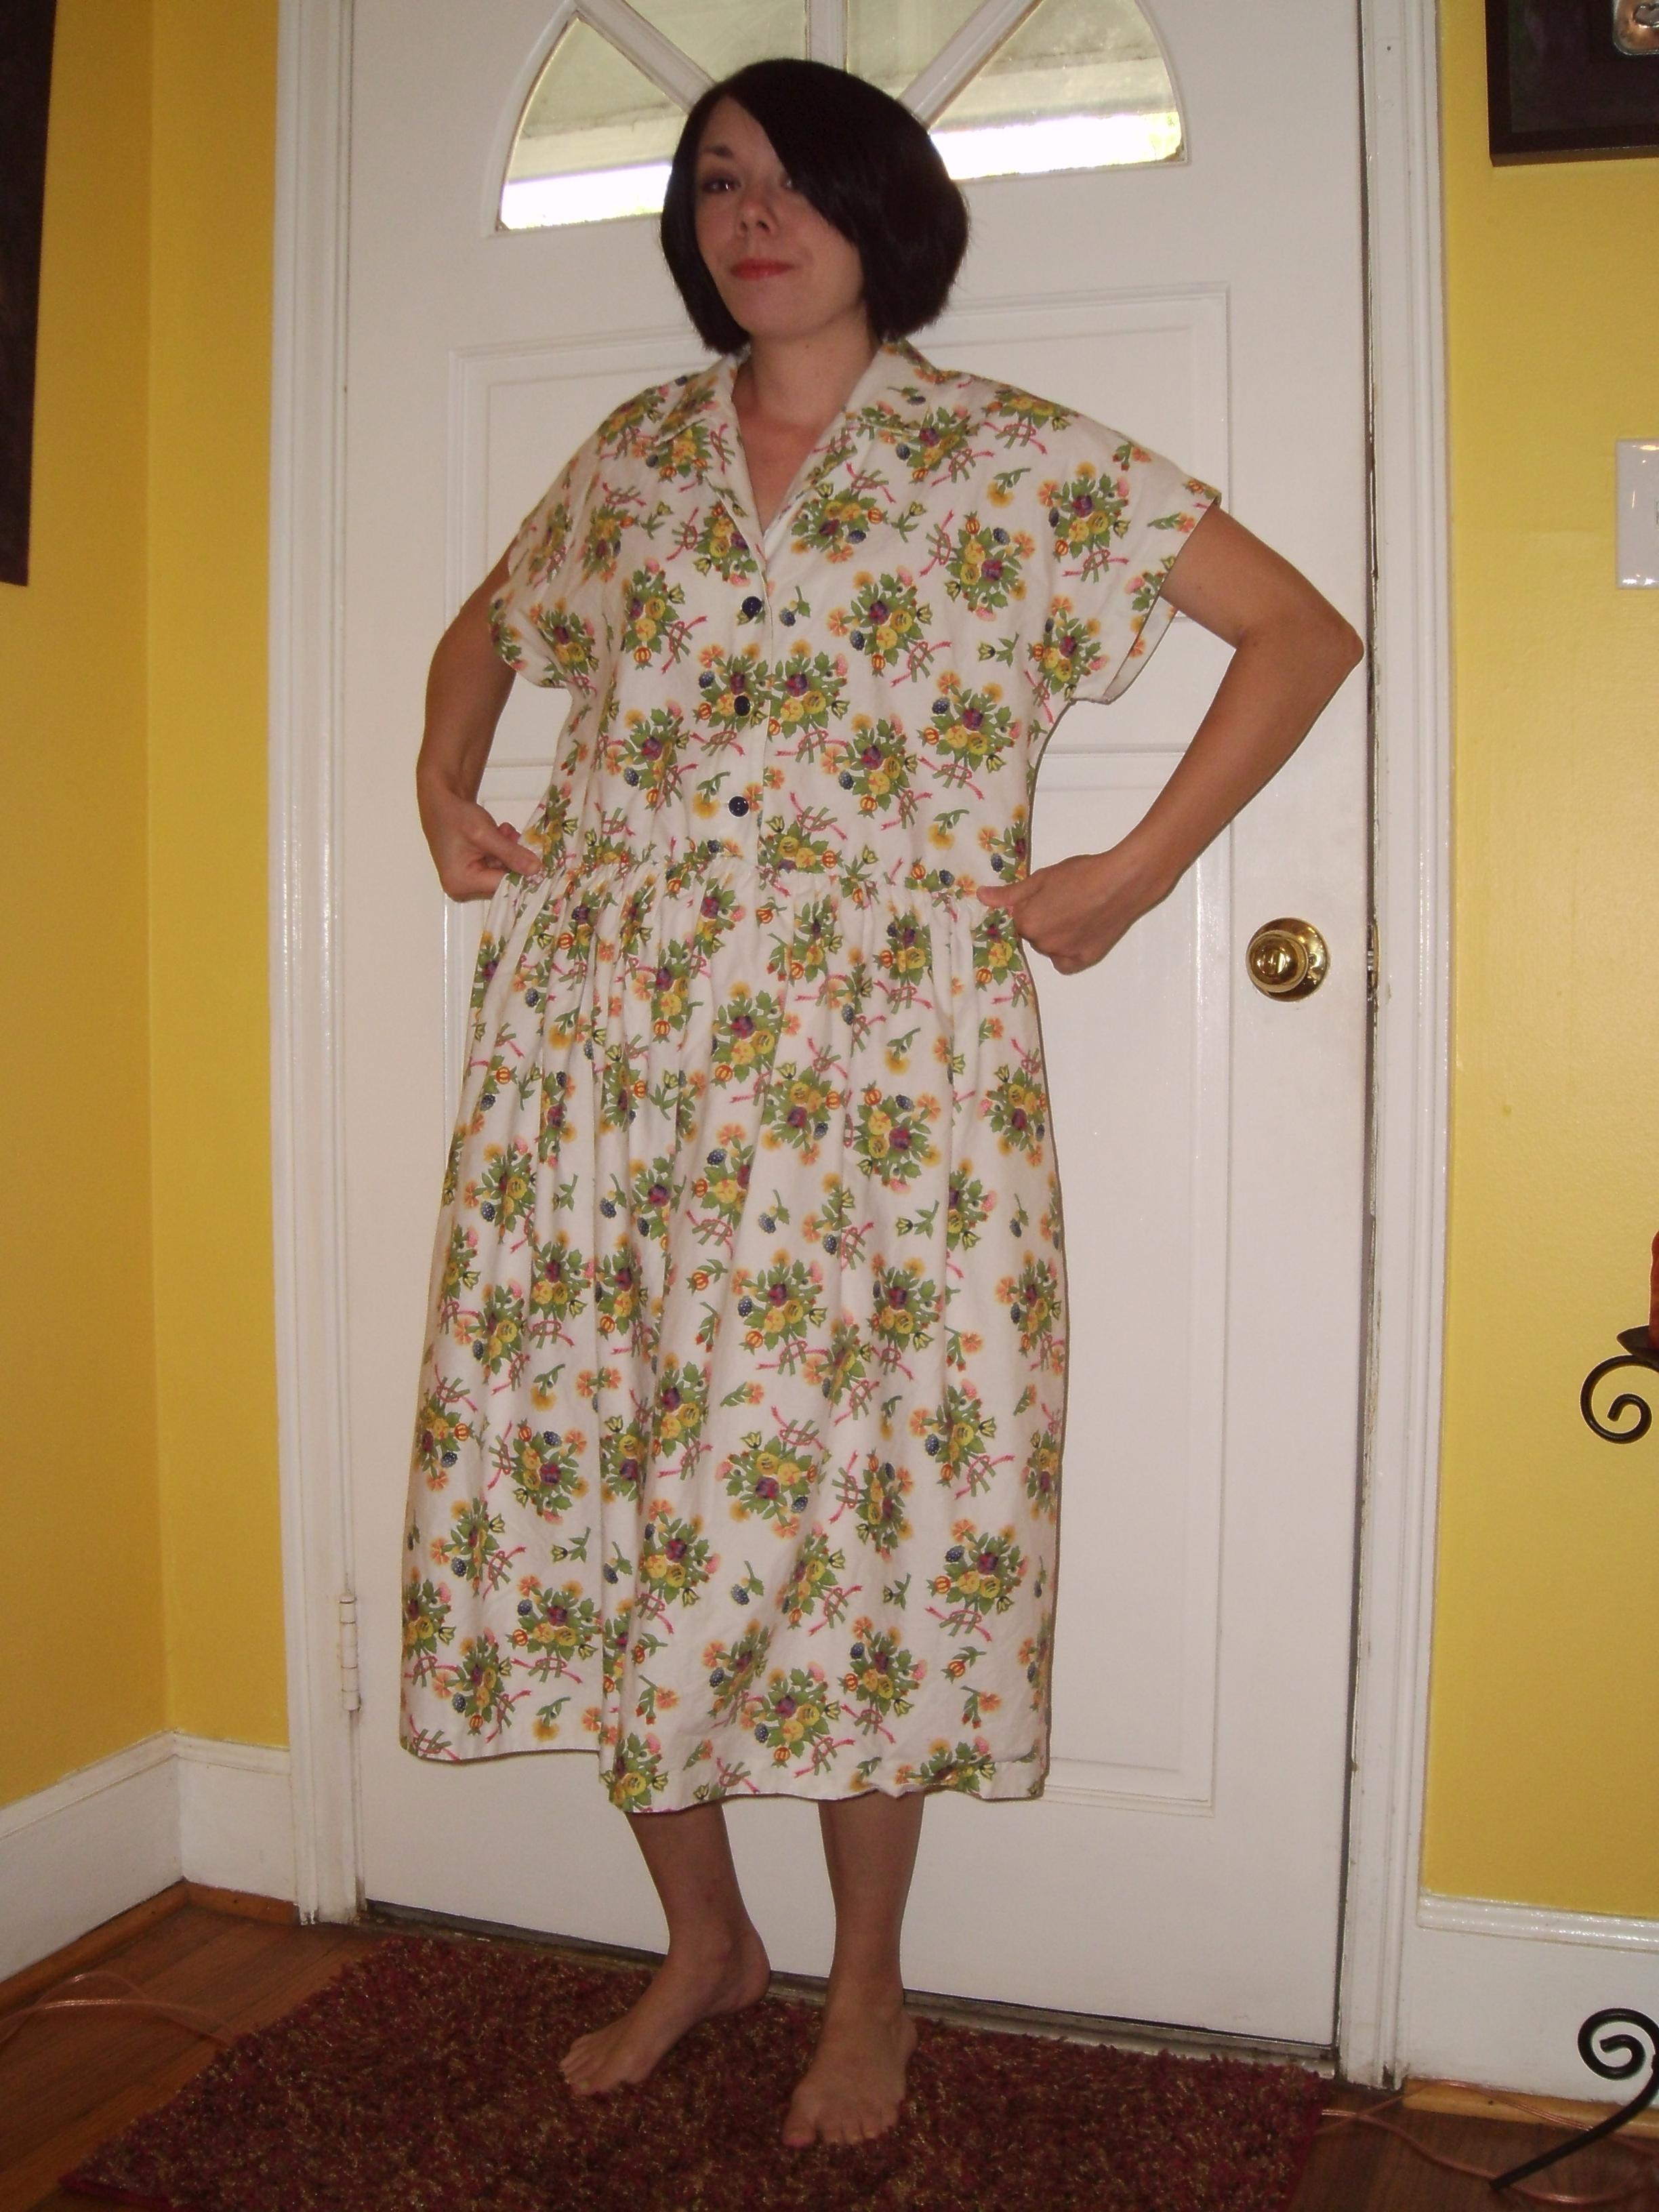 Day 92: June Cleaver Dress 2